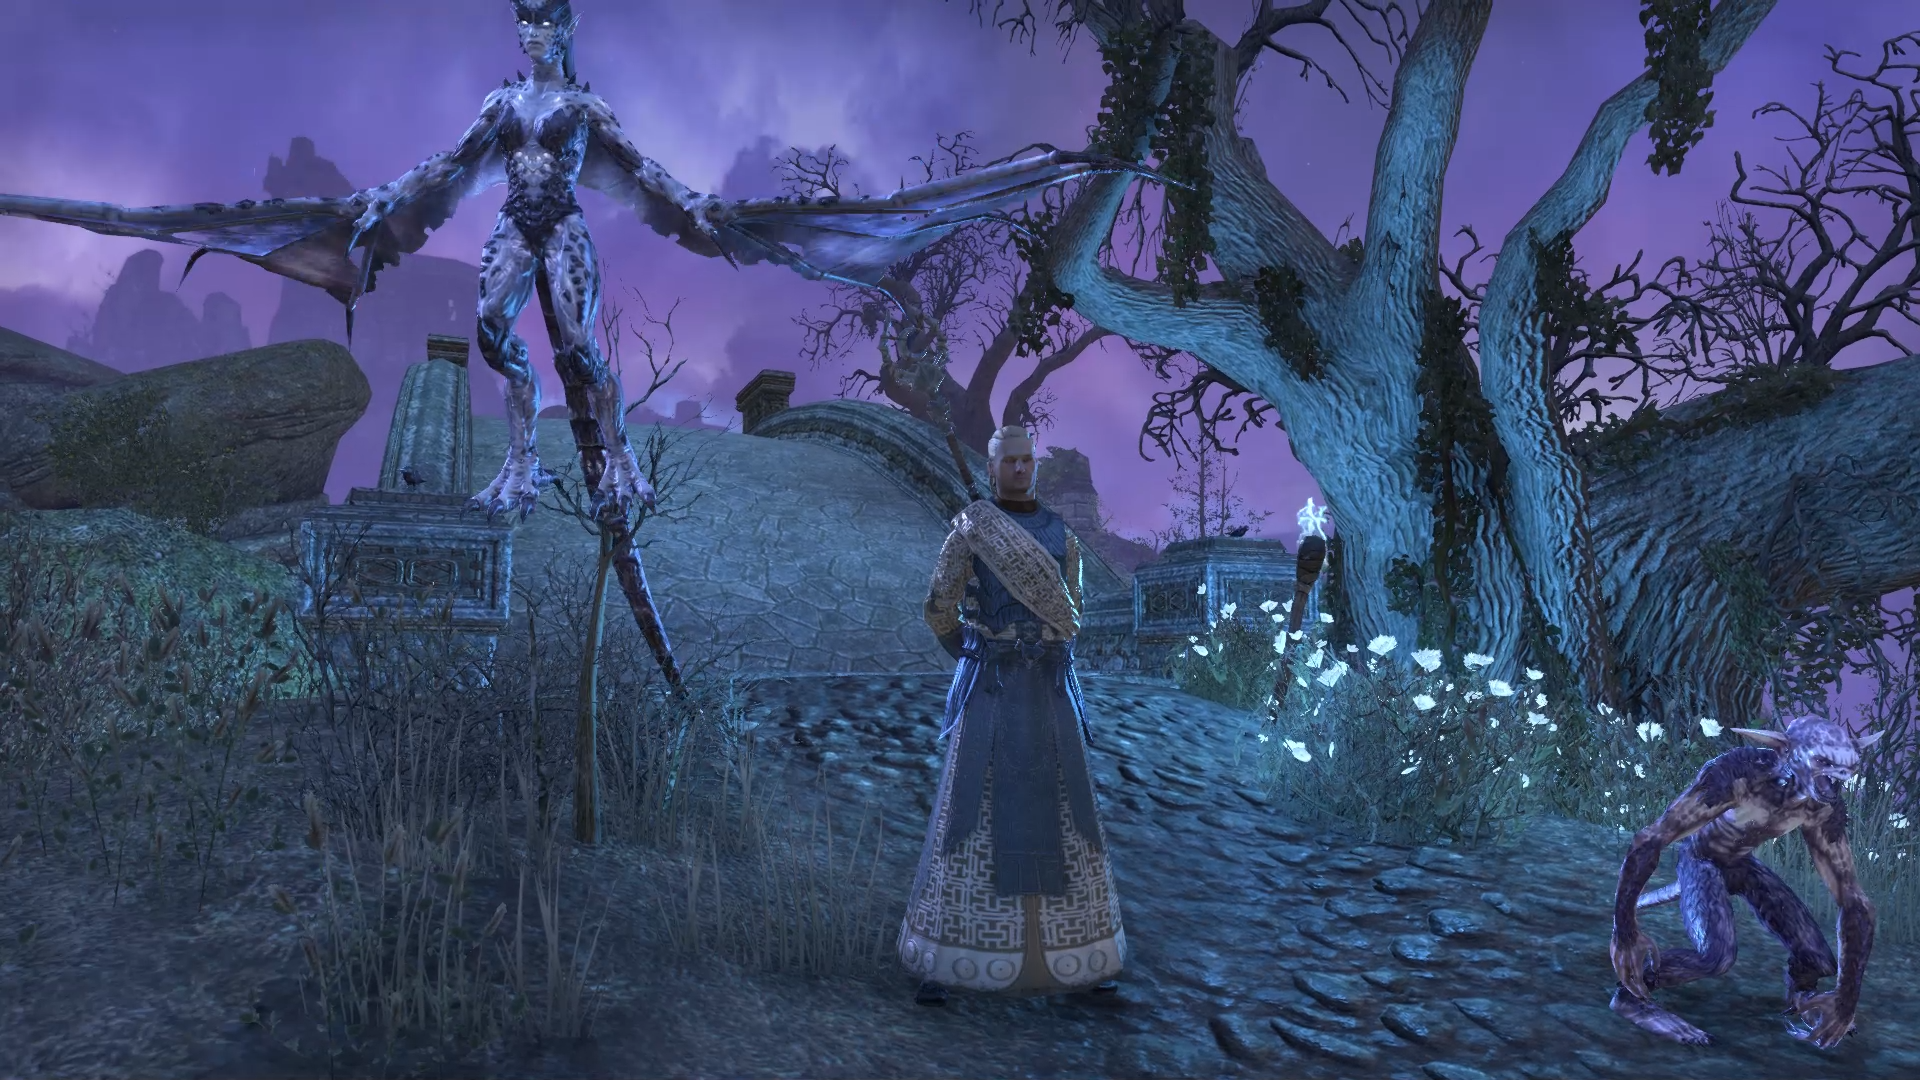 A Magicka Sorcerer Pet Build using Volatile Familiar and Twilight Matriarch